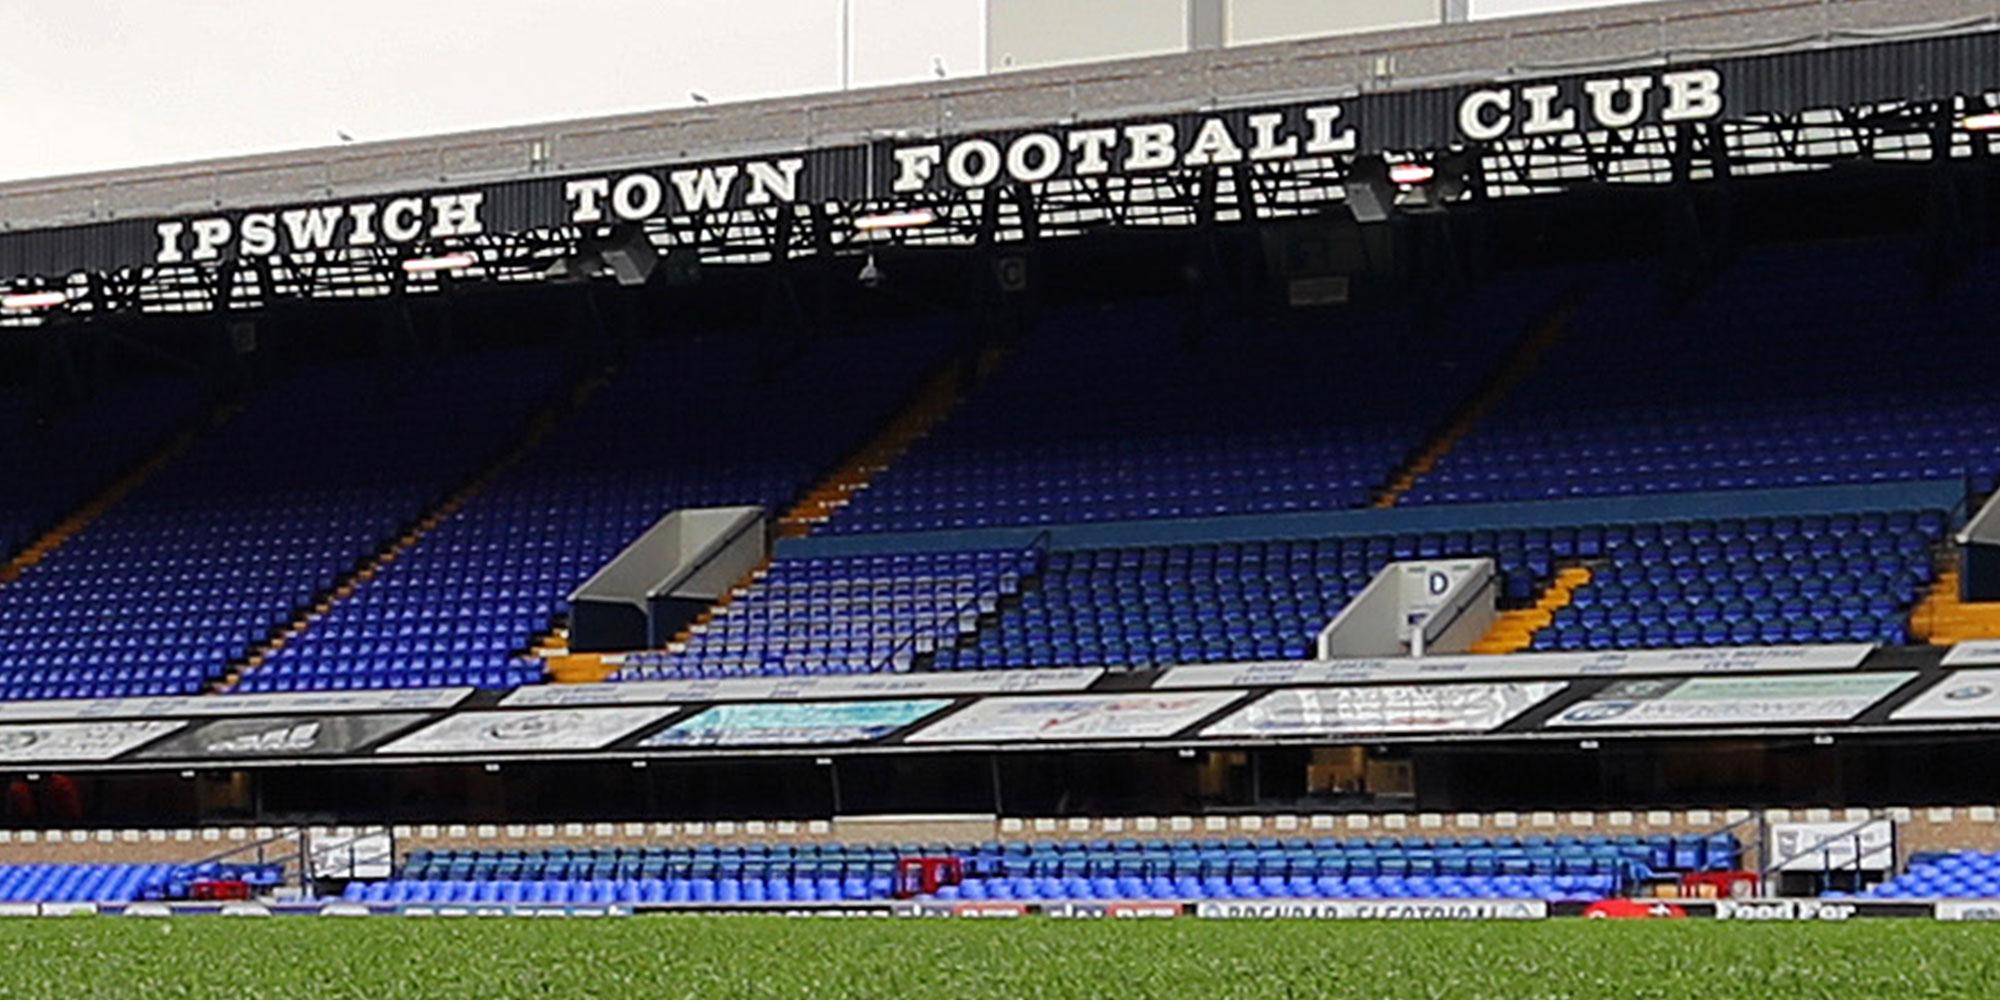 Ipswich Town v Sheffield Wednesday